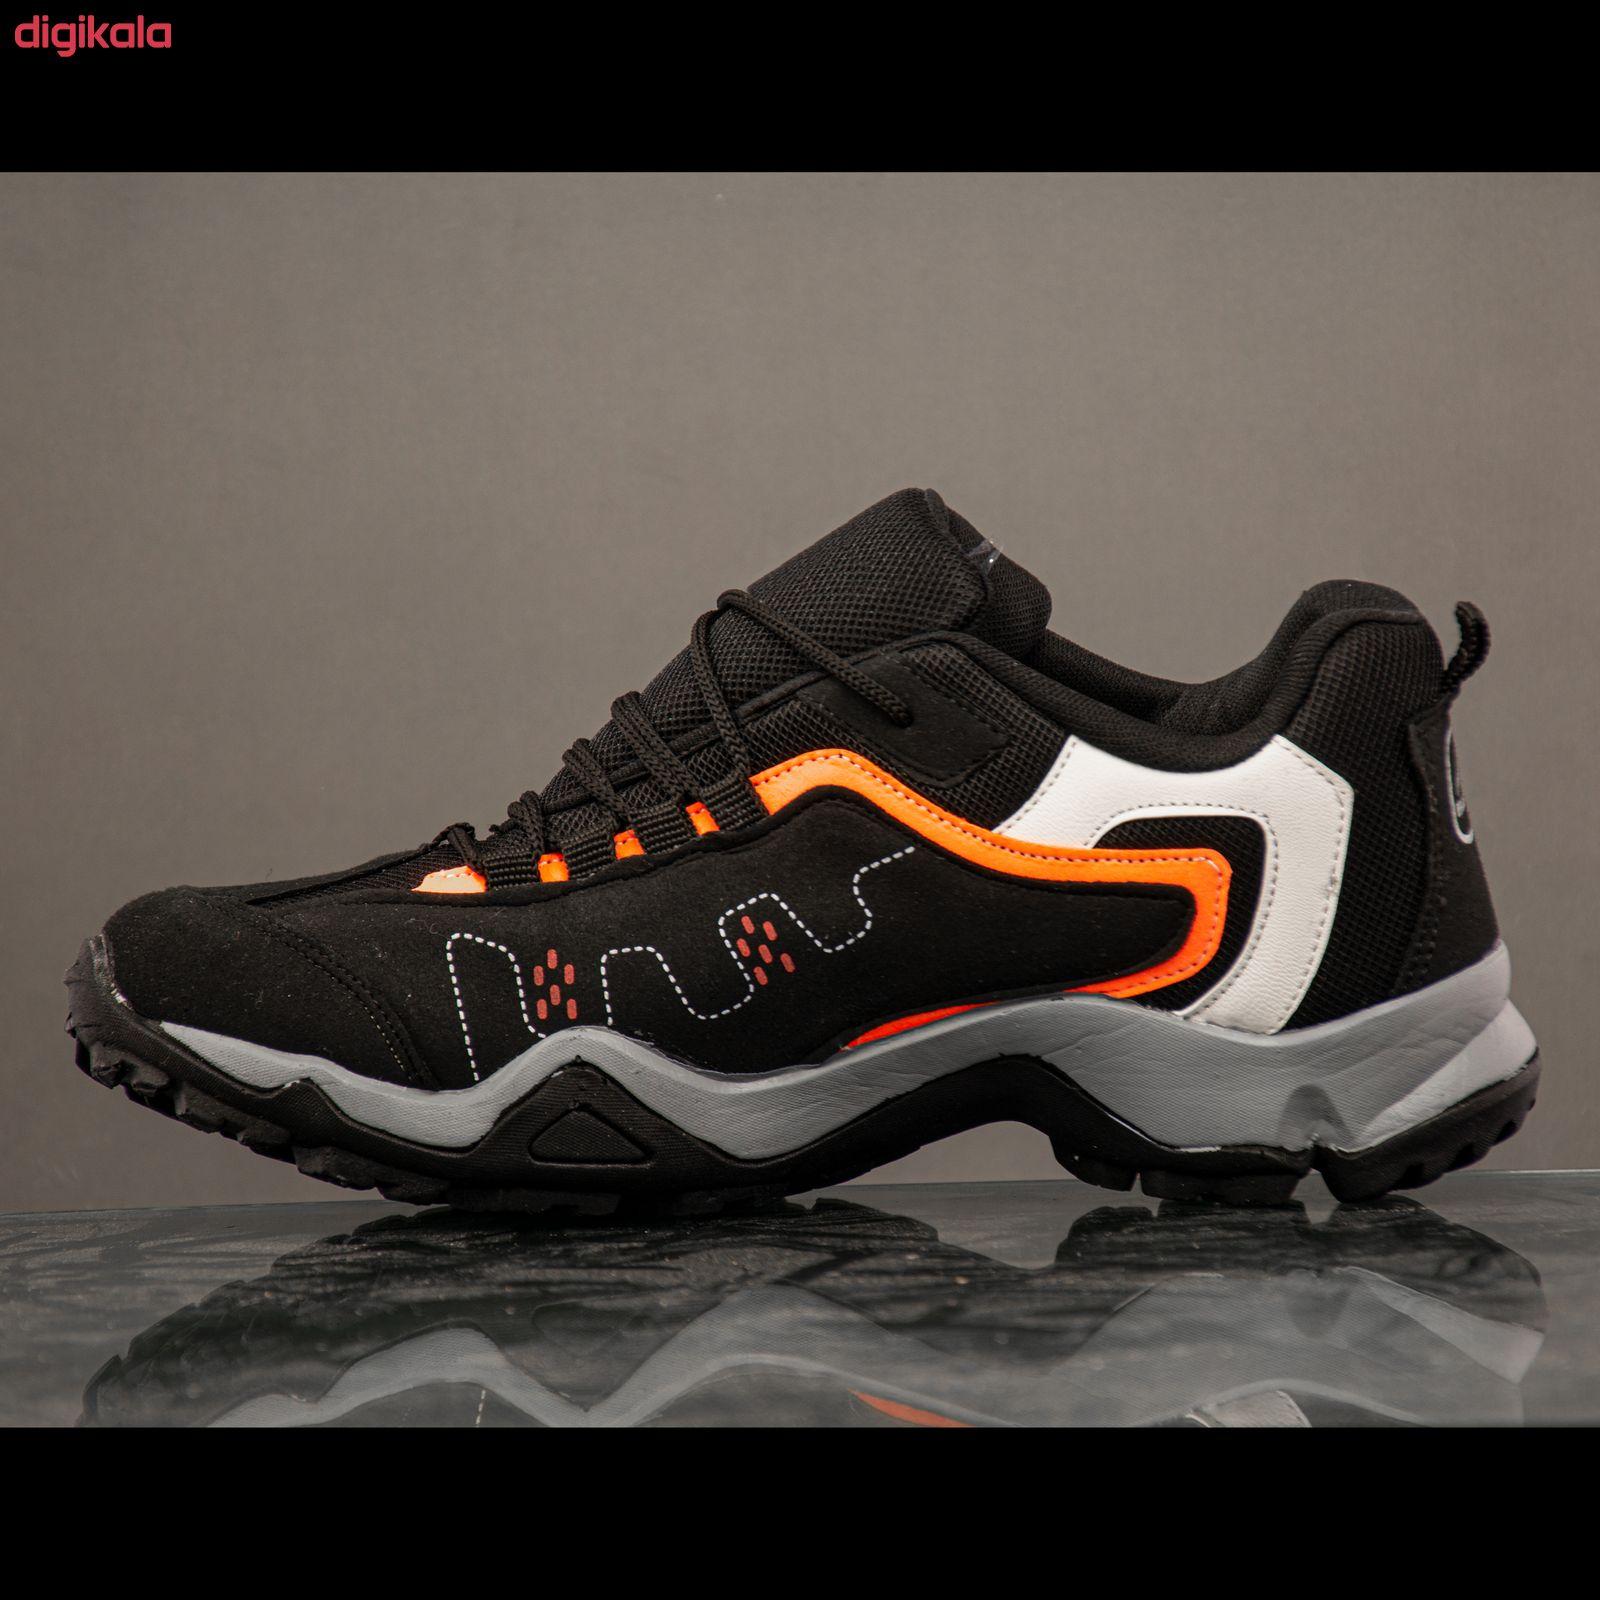 کفش کوهنوردی مردانه سارزی مدل hilas_M.e.s,Na.r.n.j_01 main 1 2